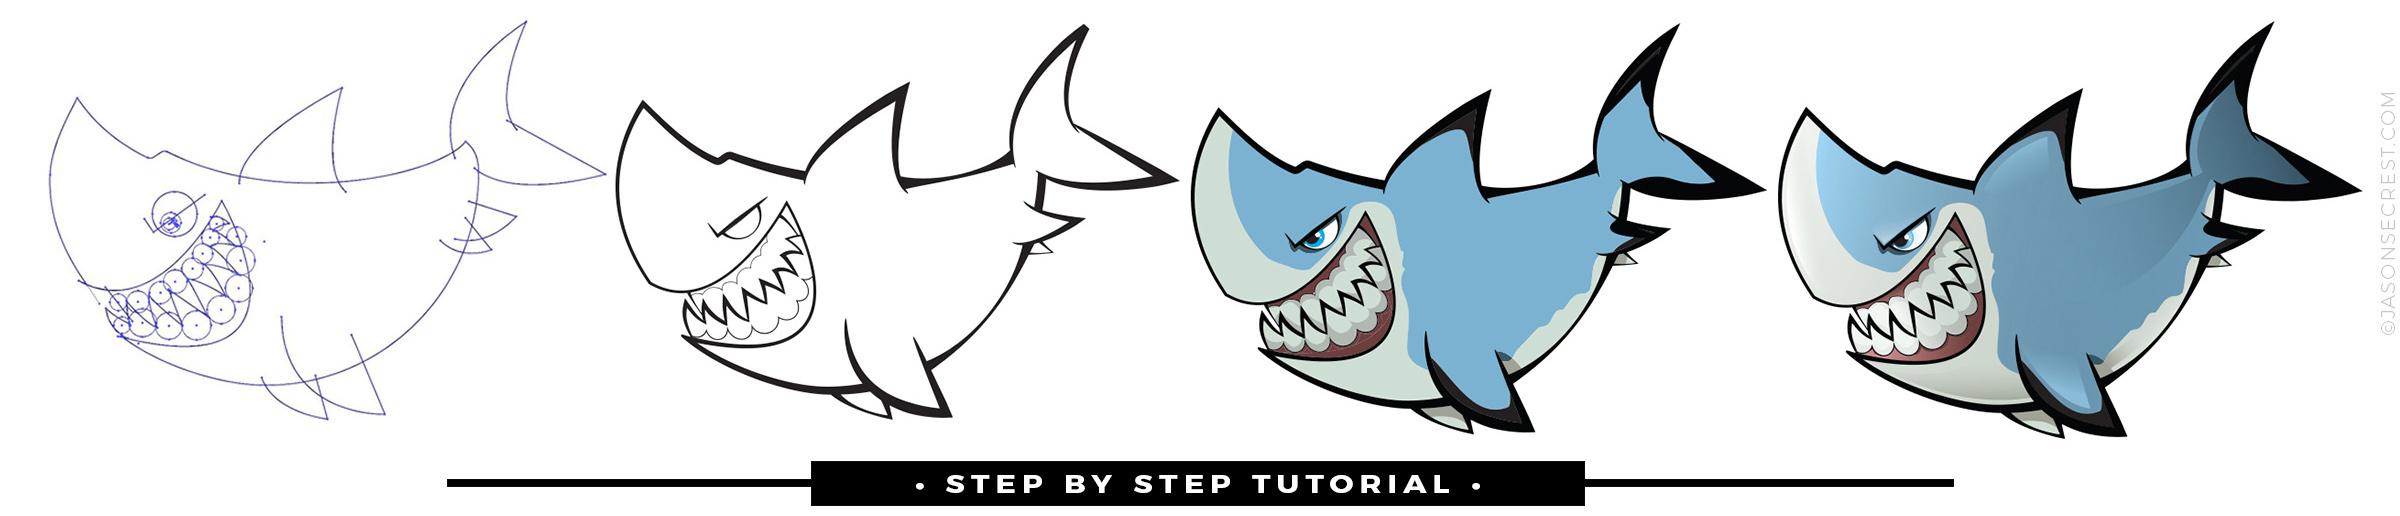 Advanced Adobe Illustrator Cartoon Coloring Tutorial - Jason Secrest